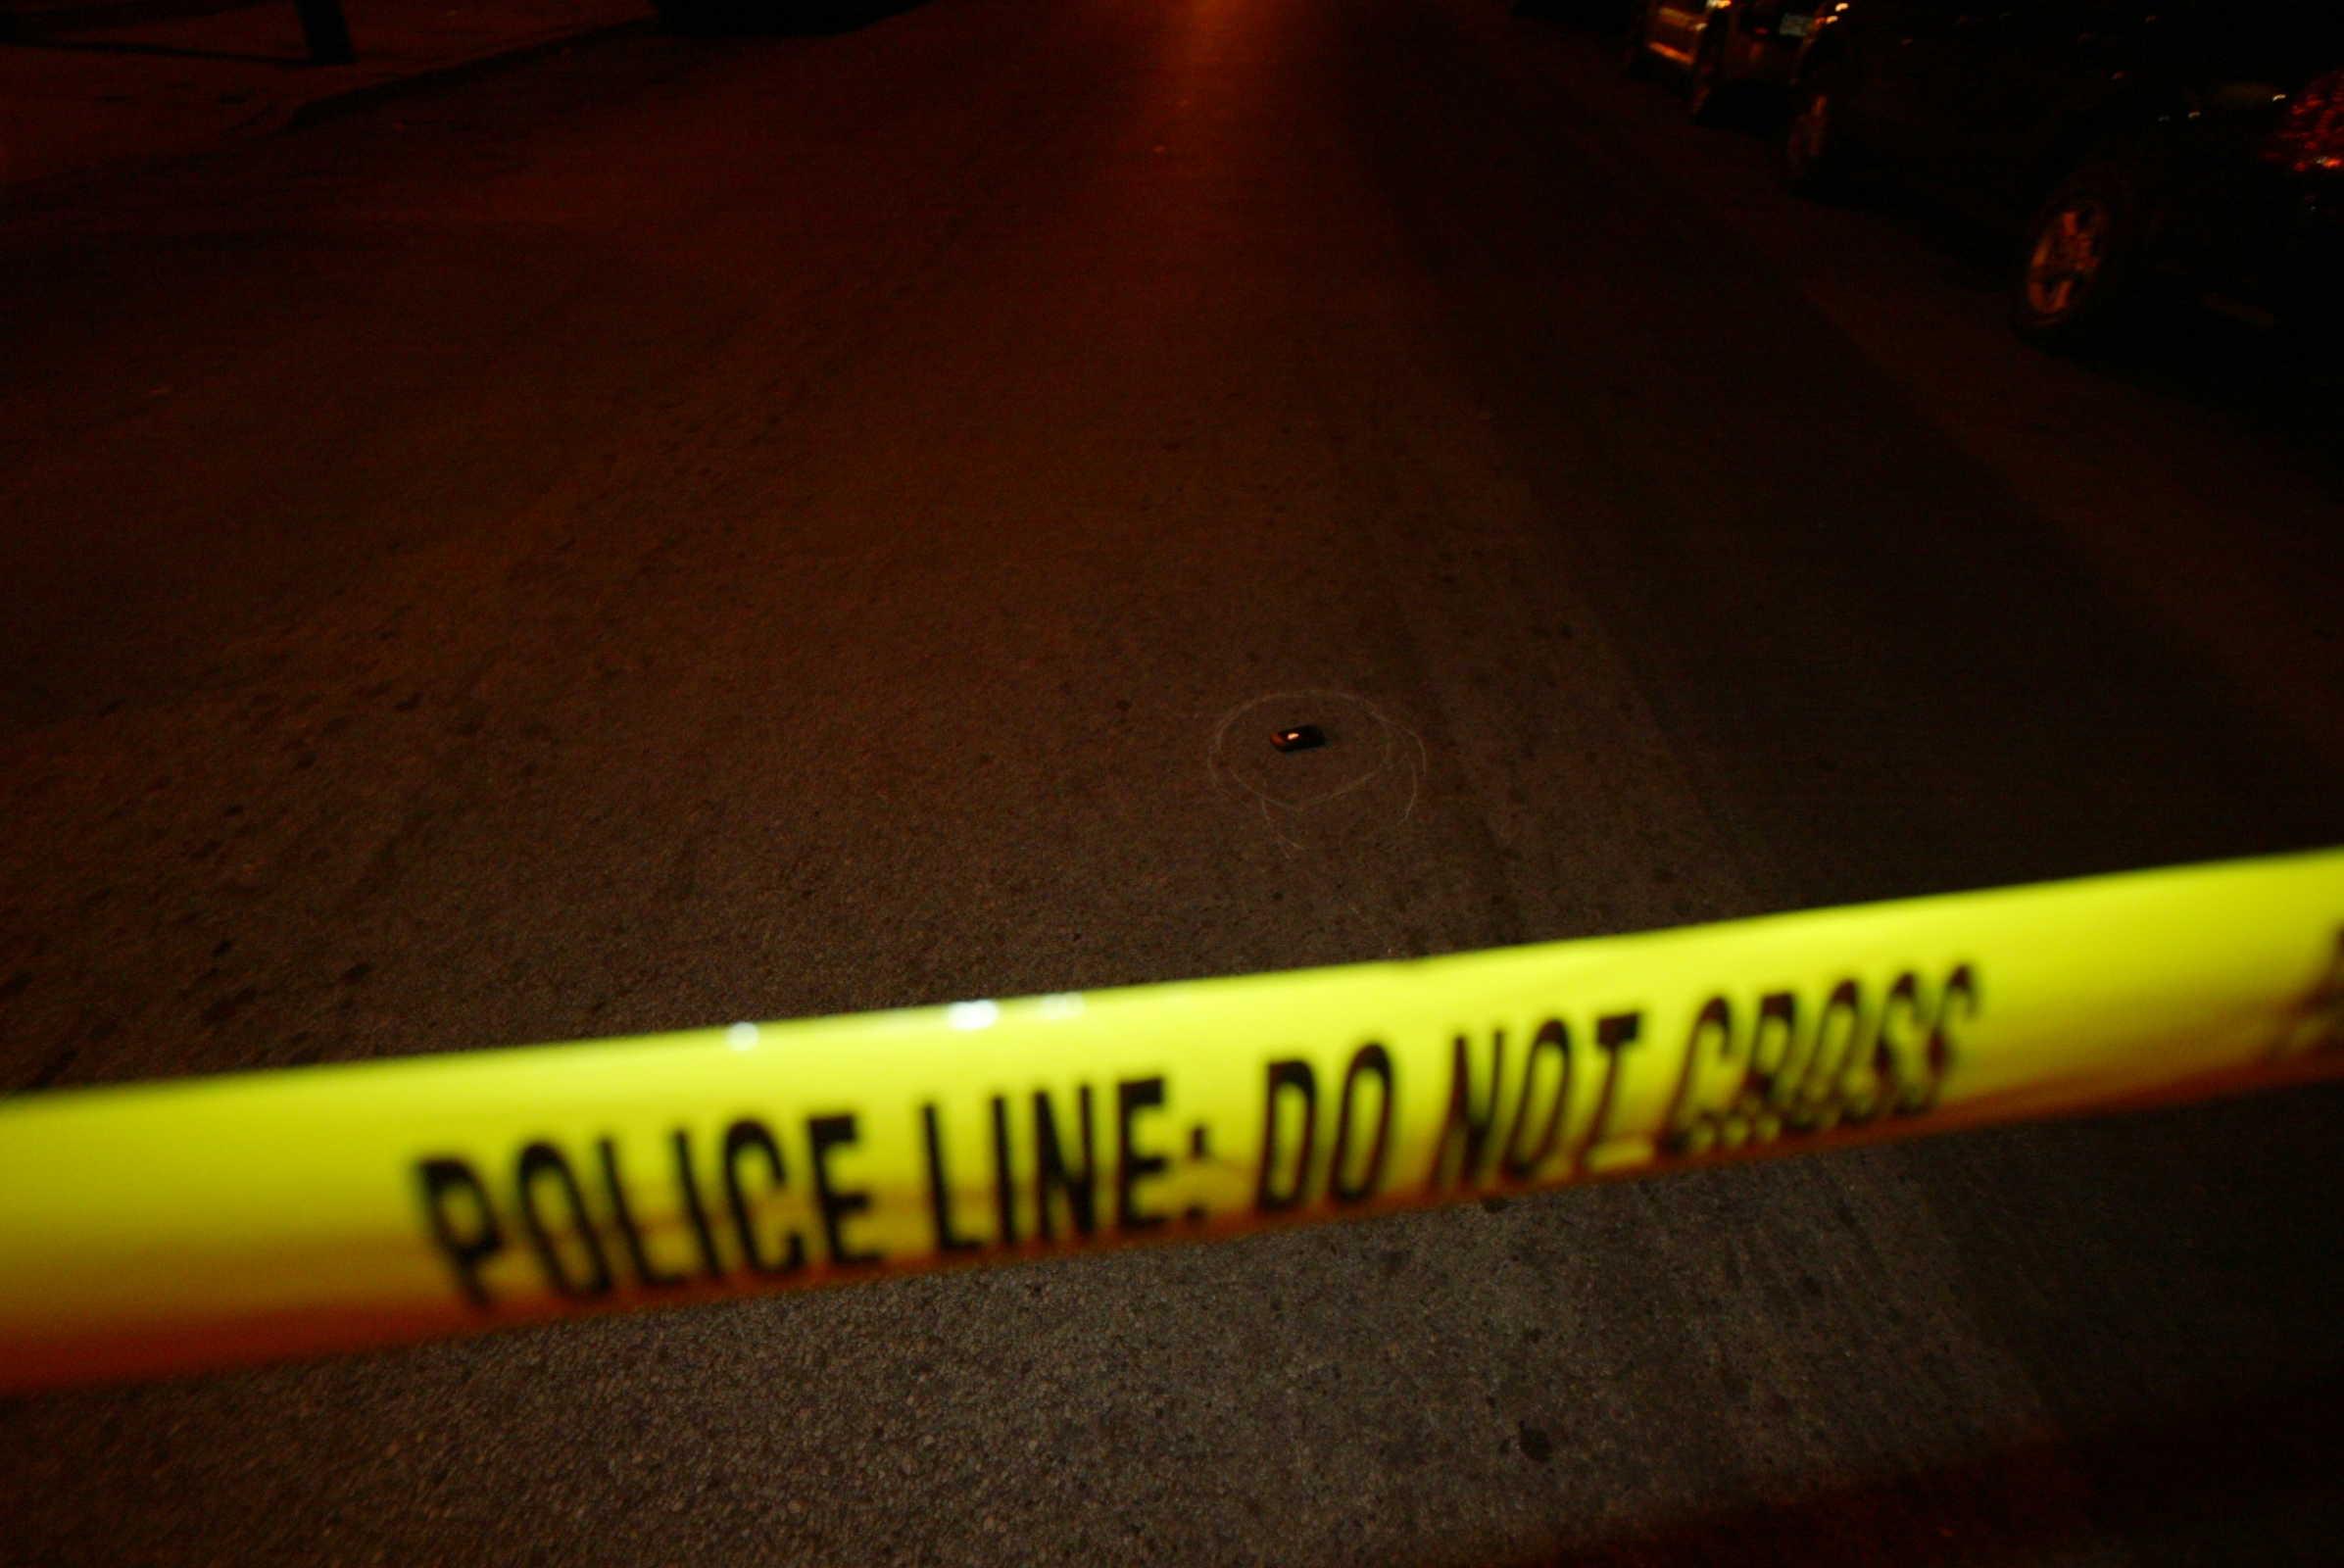 Police tape Police Line: Do Not Cross - January 10, 2007.   Steven M. Falk / Philadelphia Daily News.